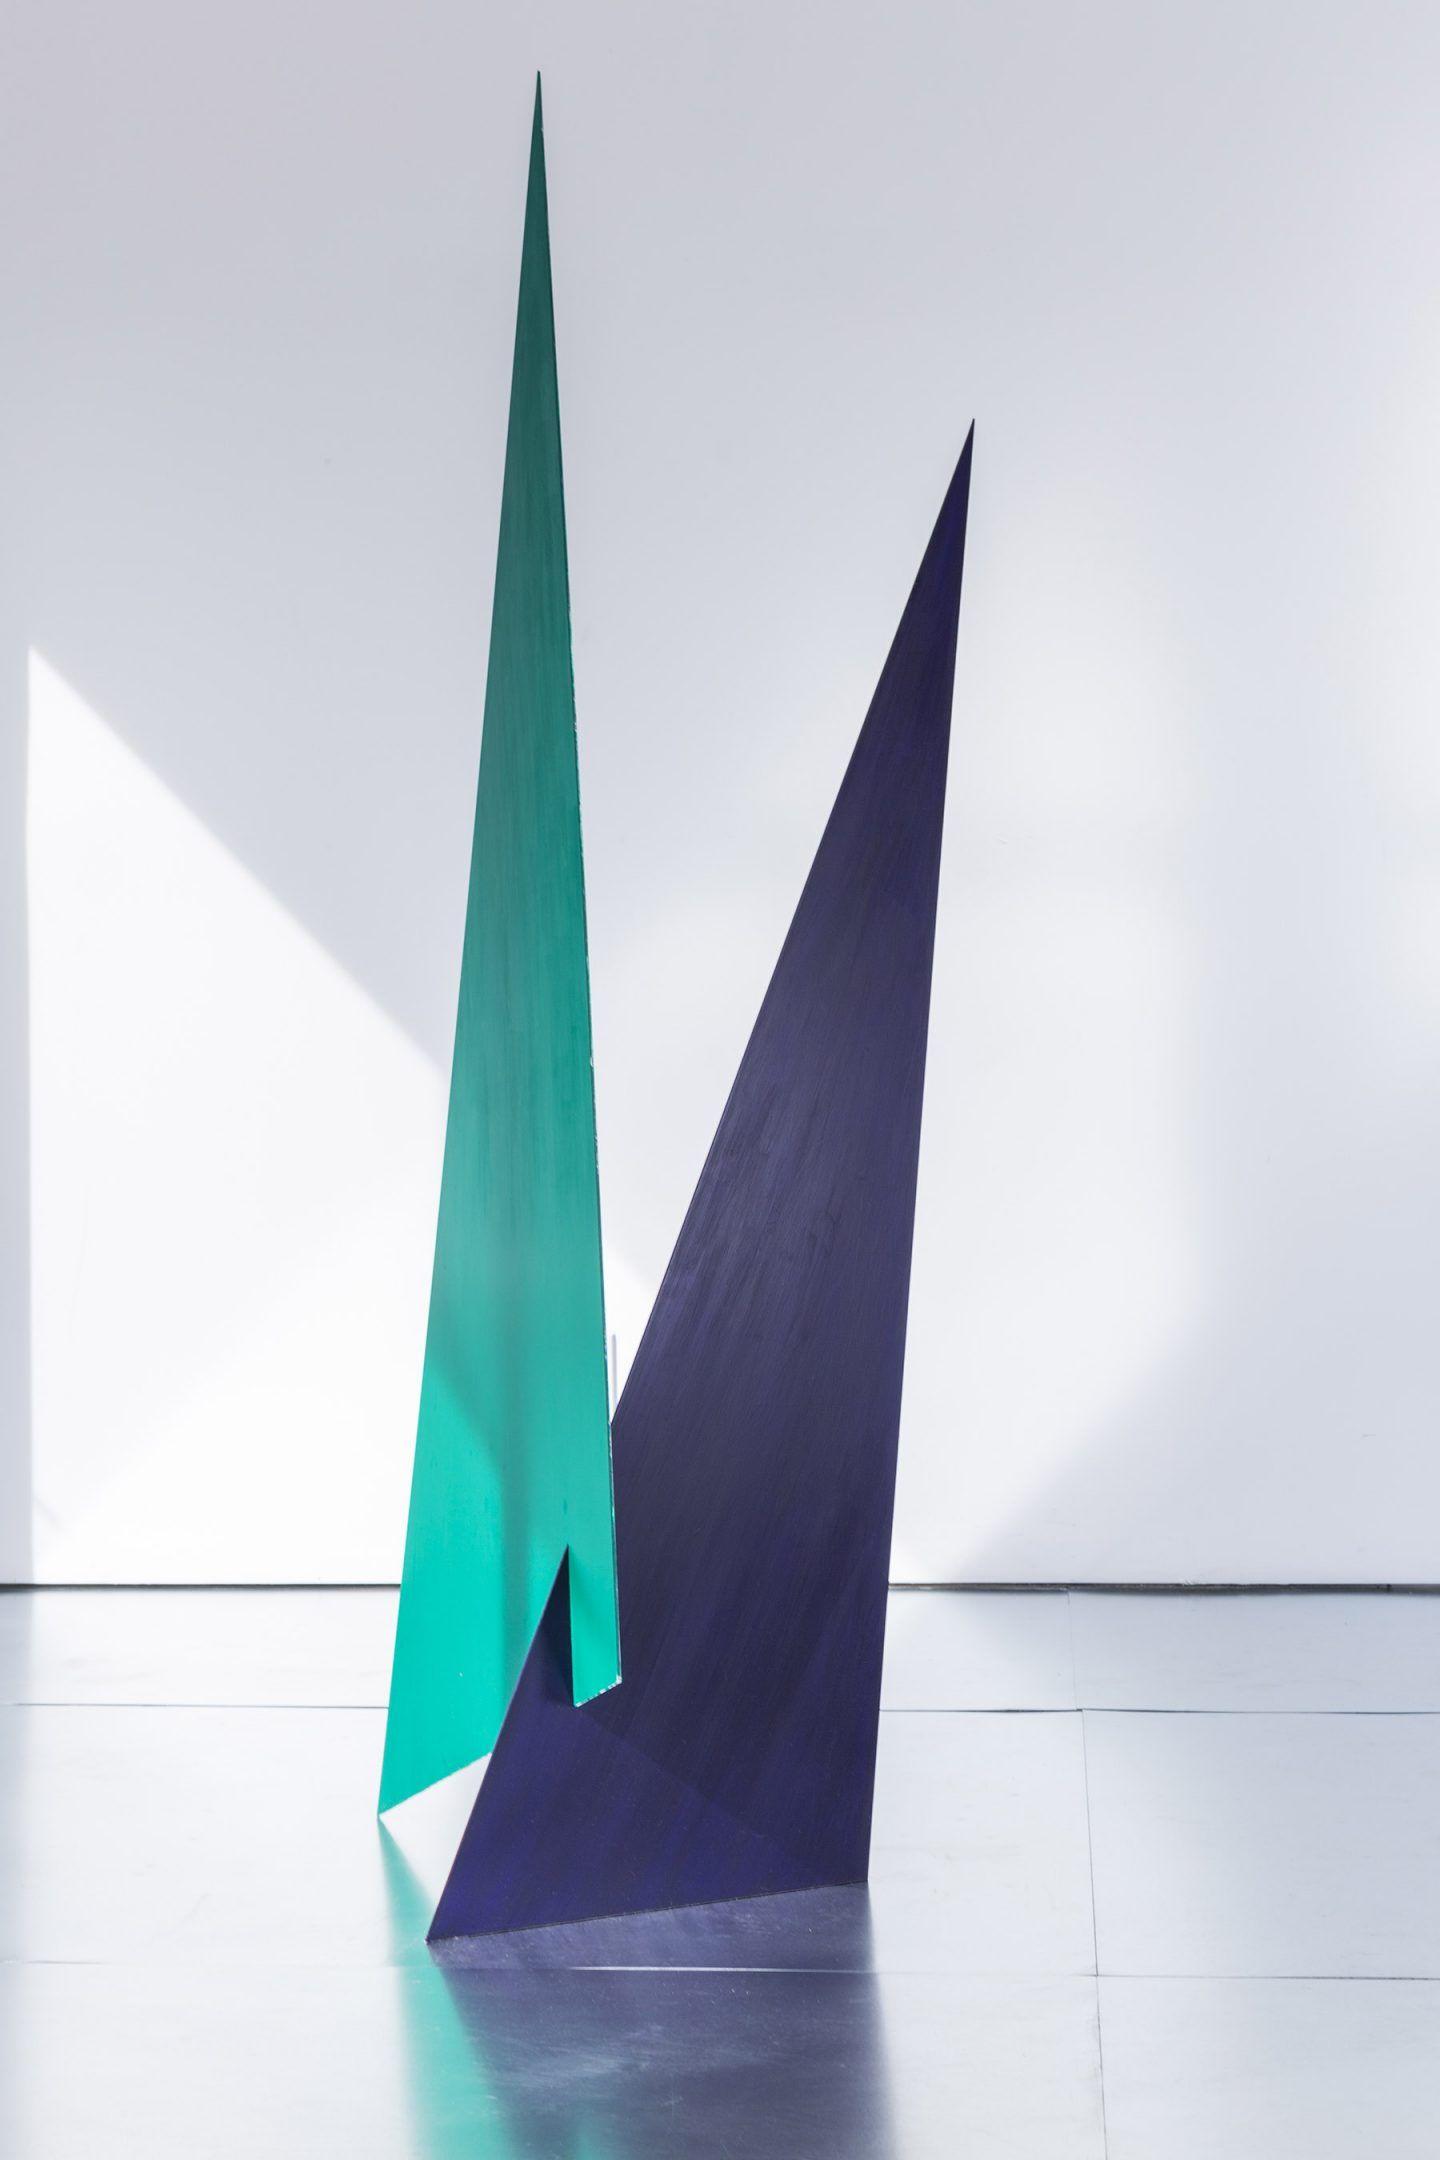 IGNANT-Art-Amalie-Jakobsen-015